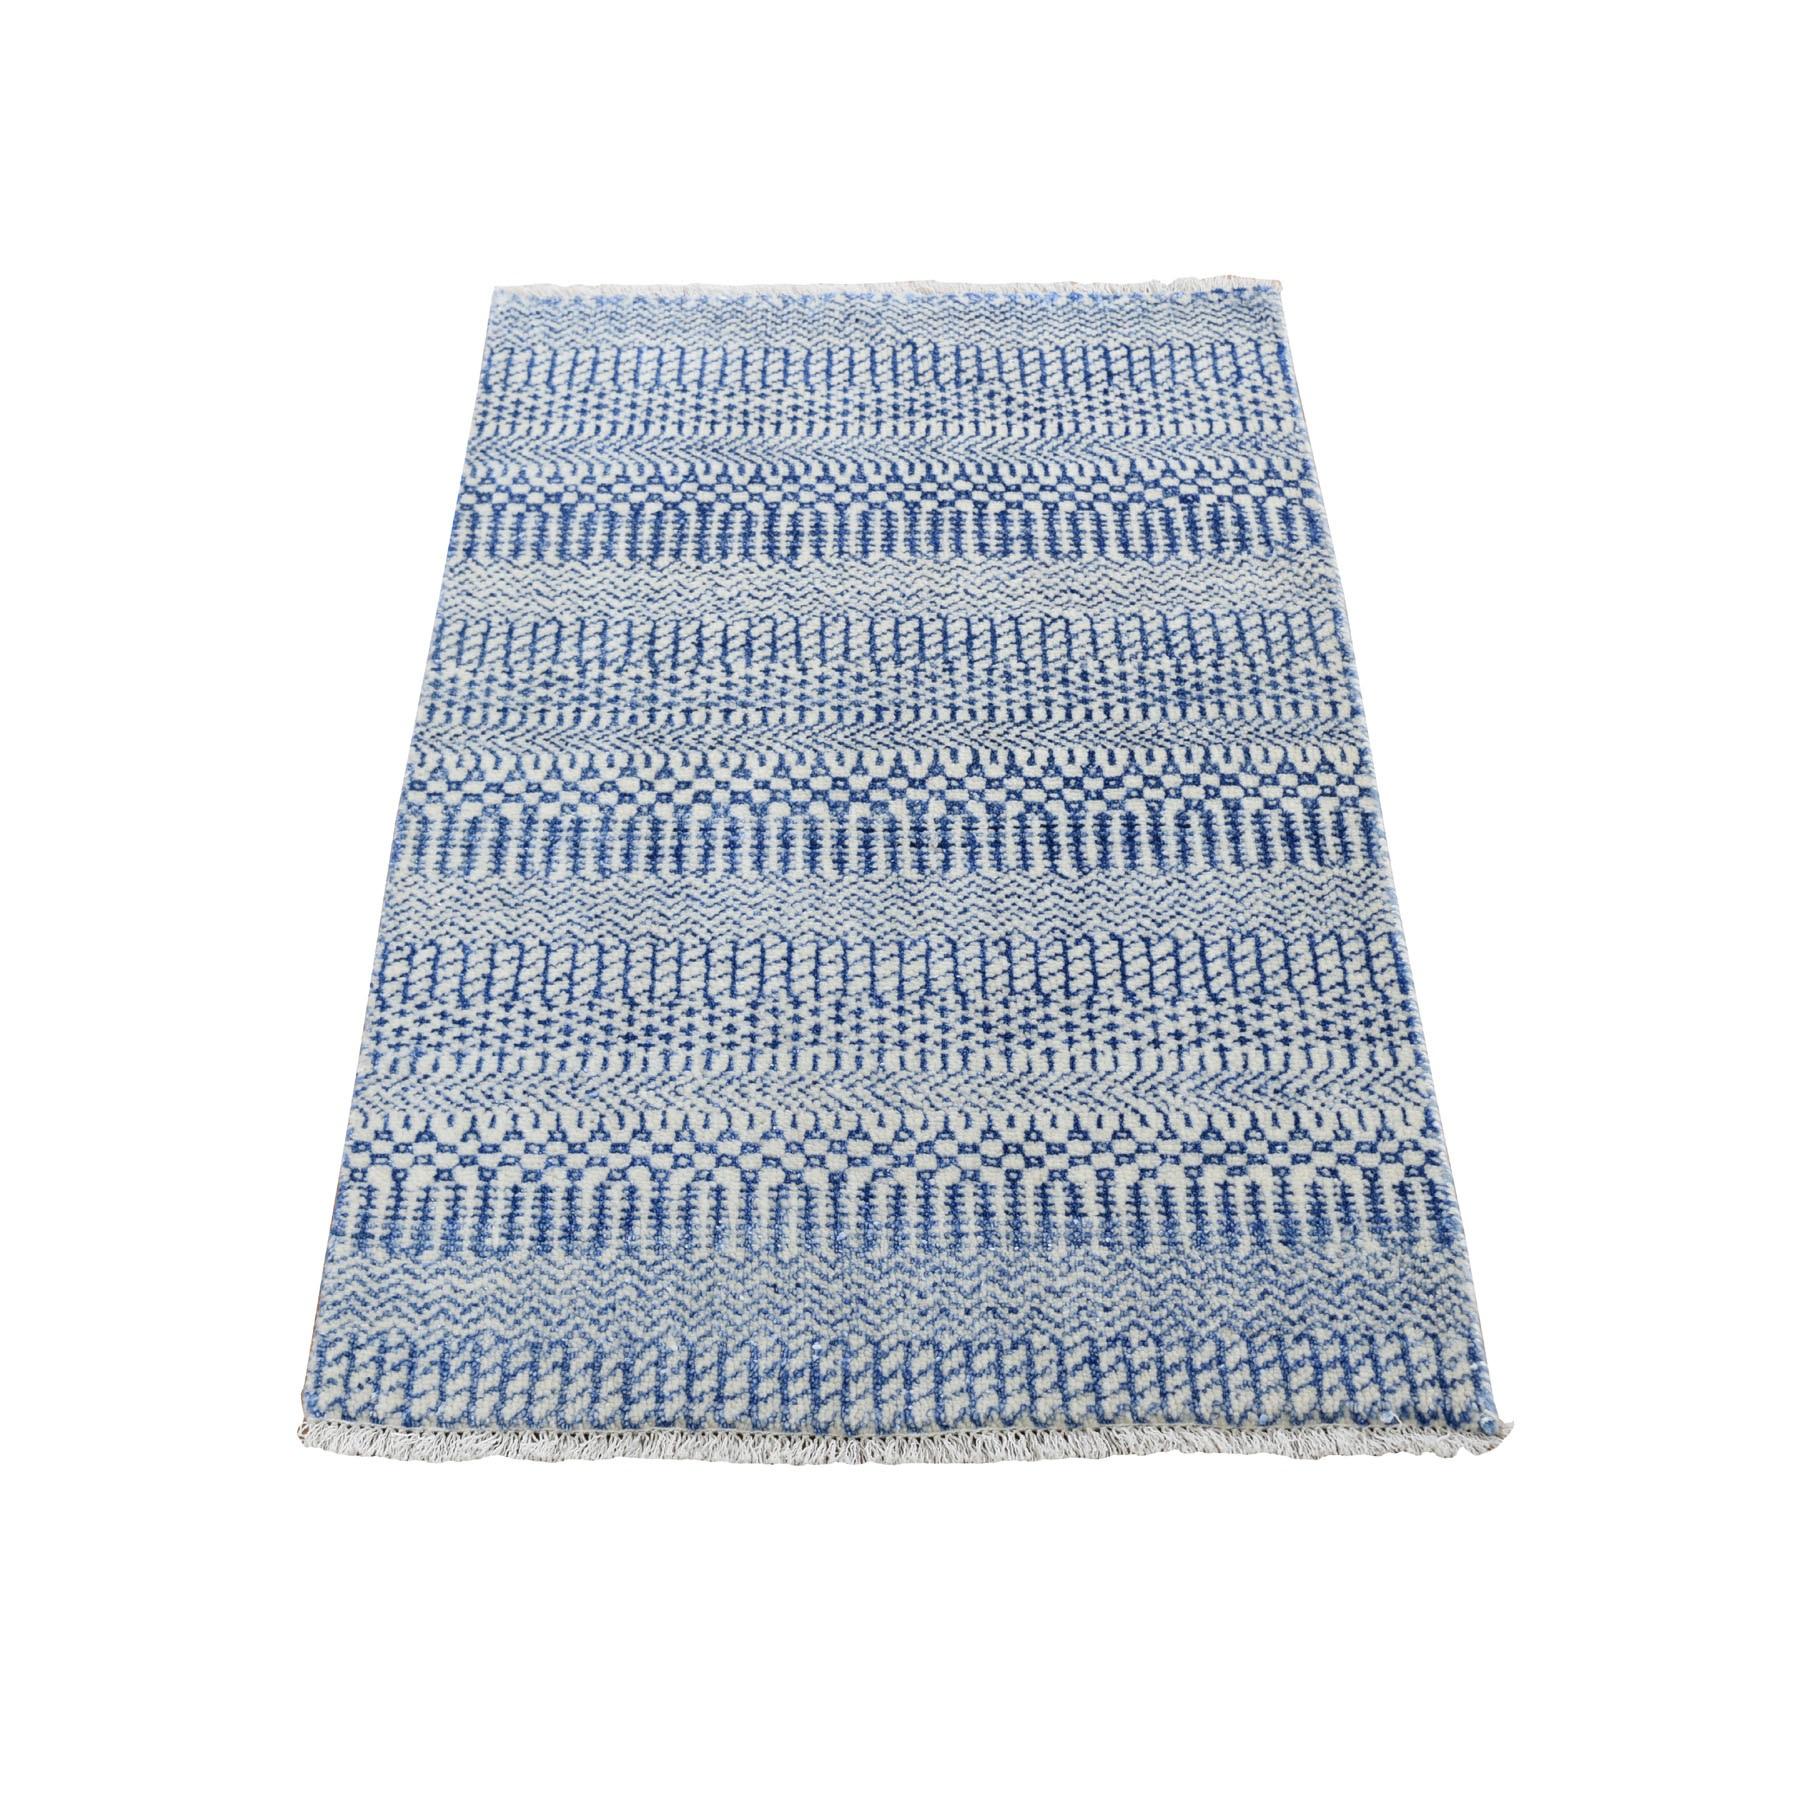 2'x3' Blue Modern Gabbeh Hand Knotted Grass Design Oriental Rug